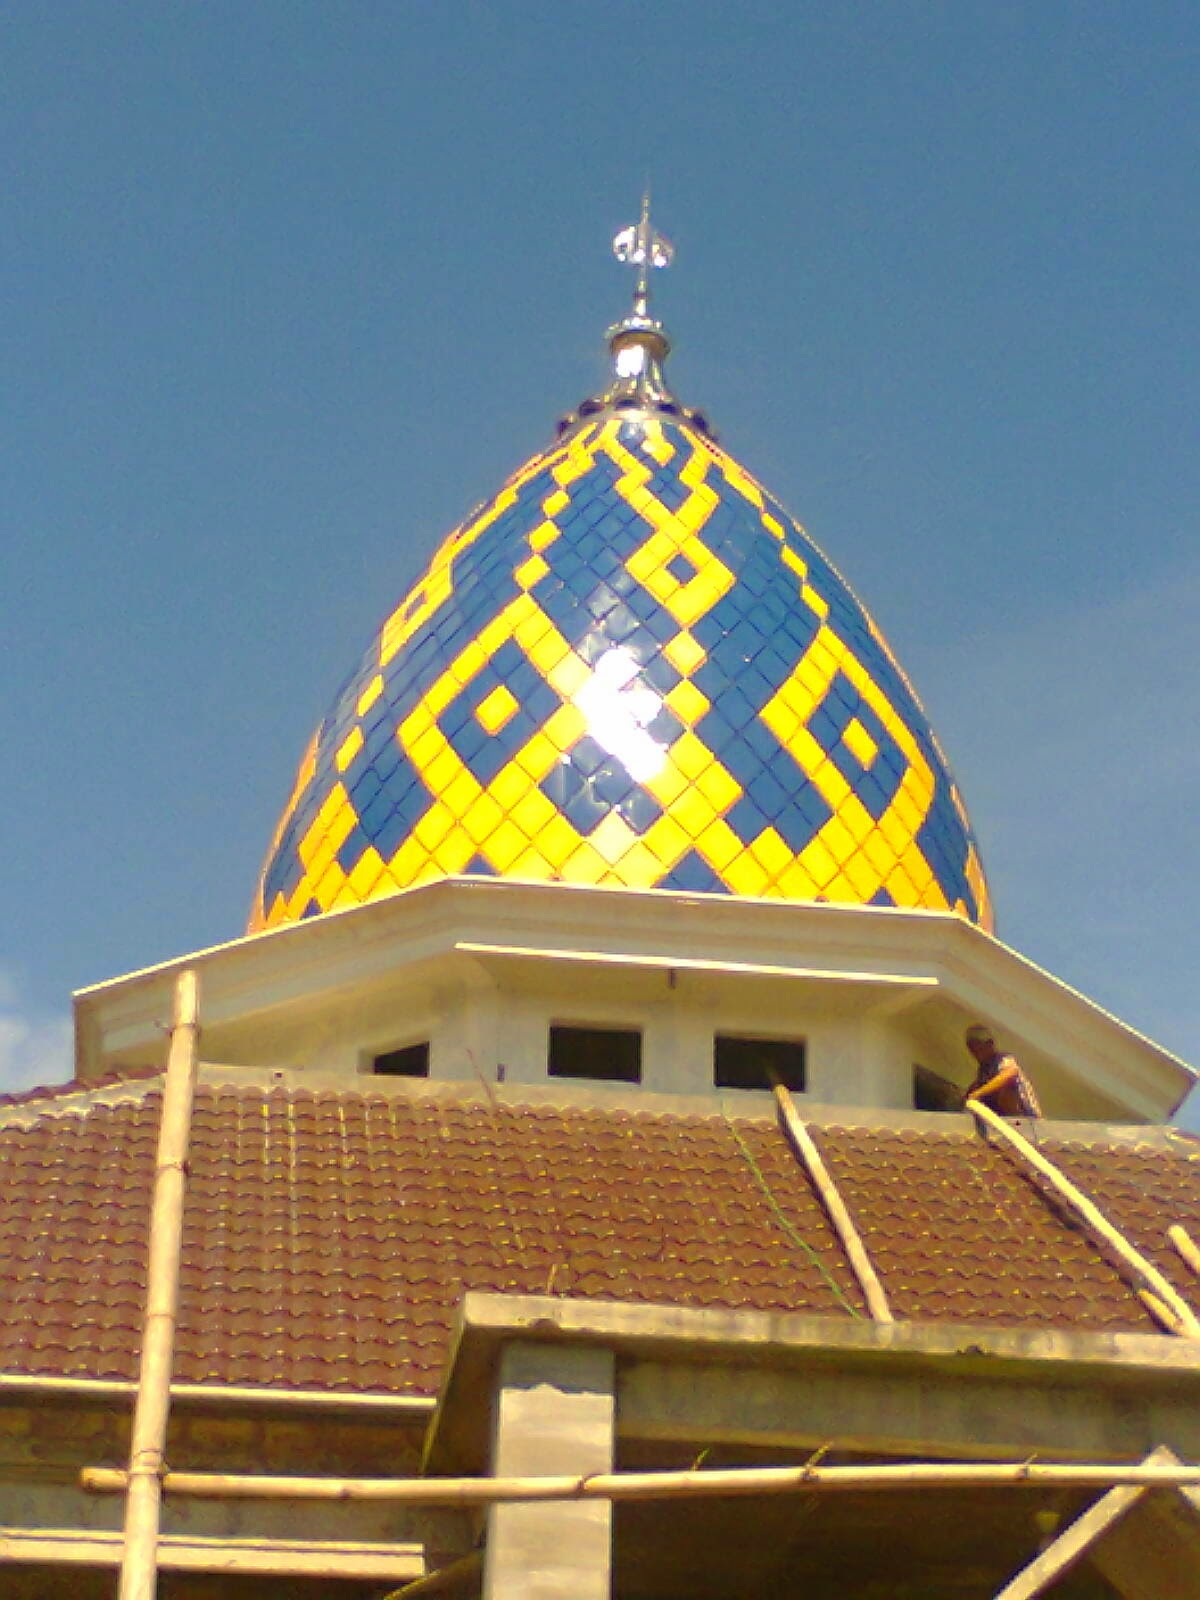 Desain Plafon Masjid Minimalis Desain Rumah Minimalis Terbaru